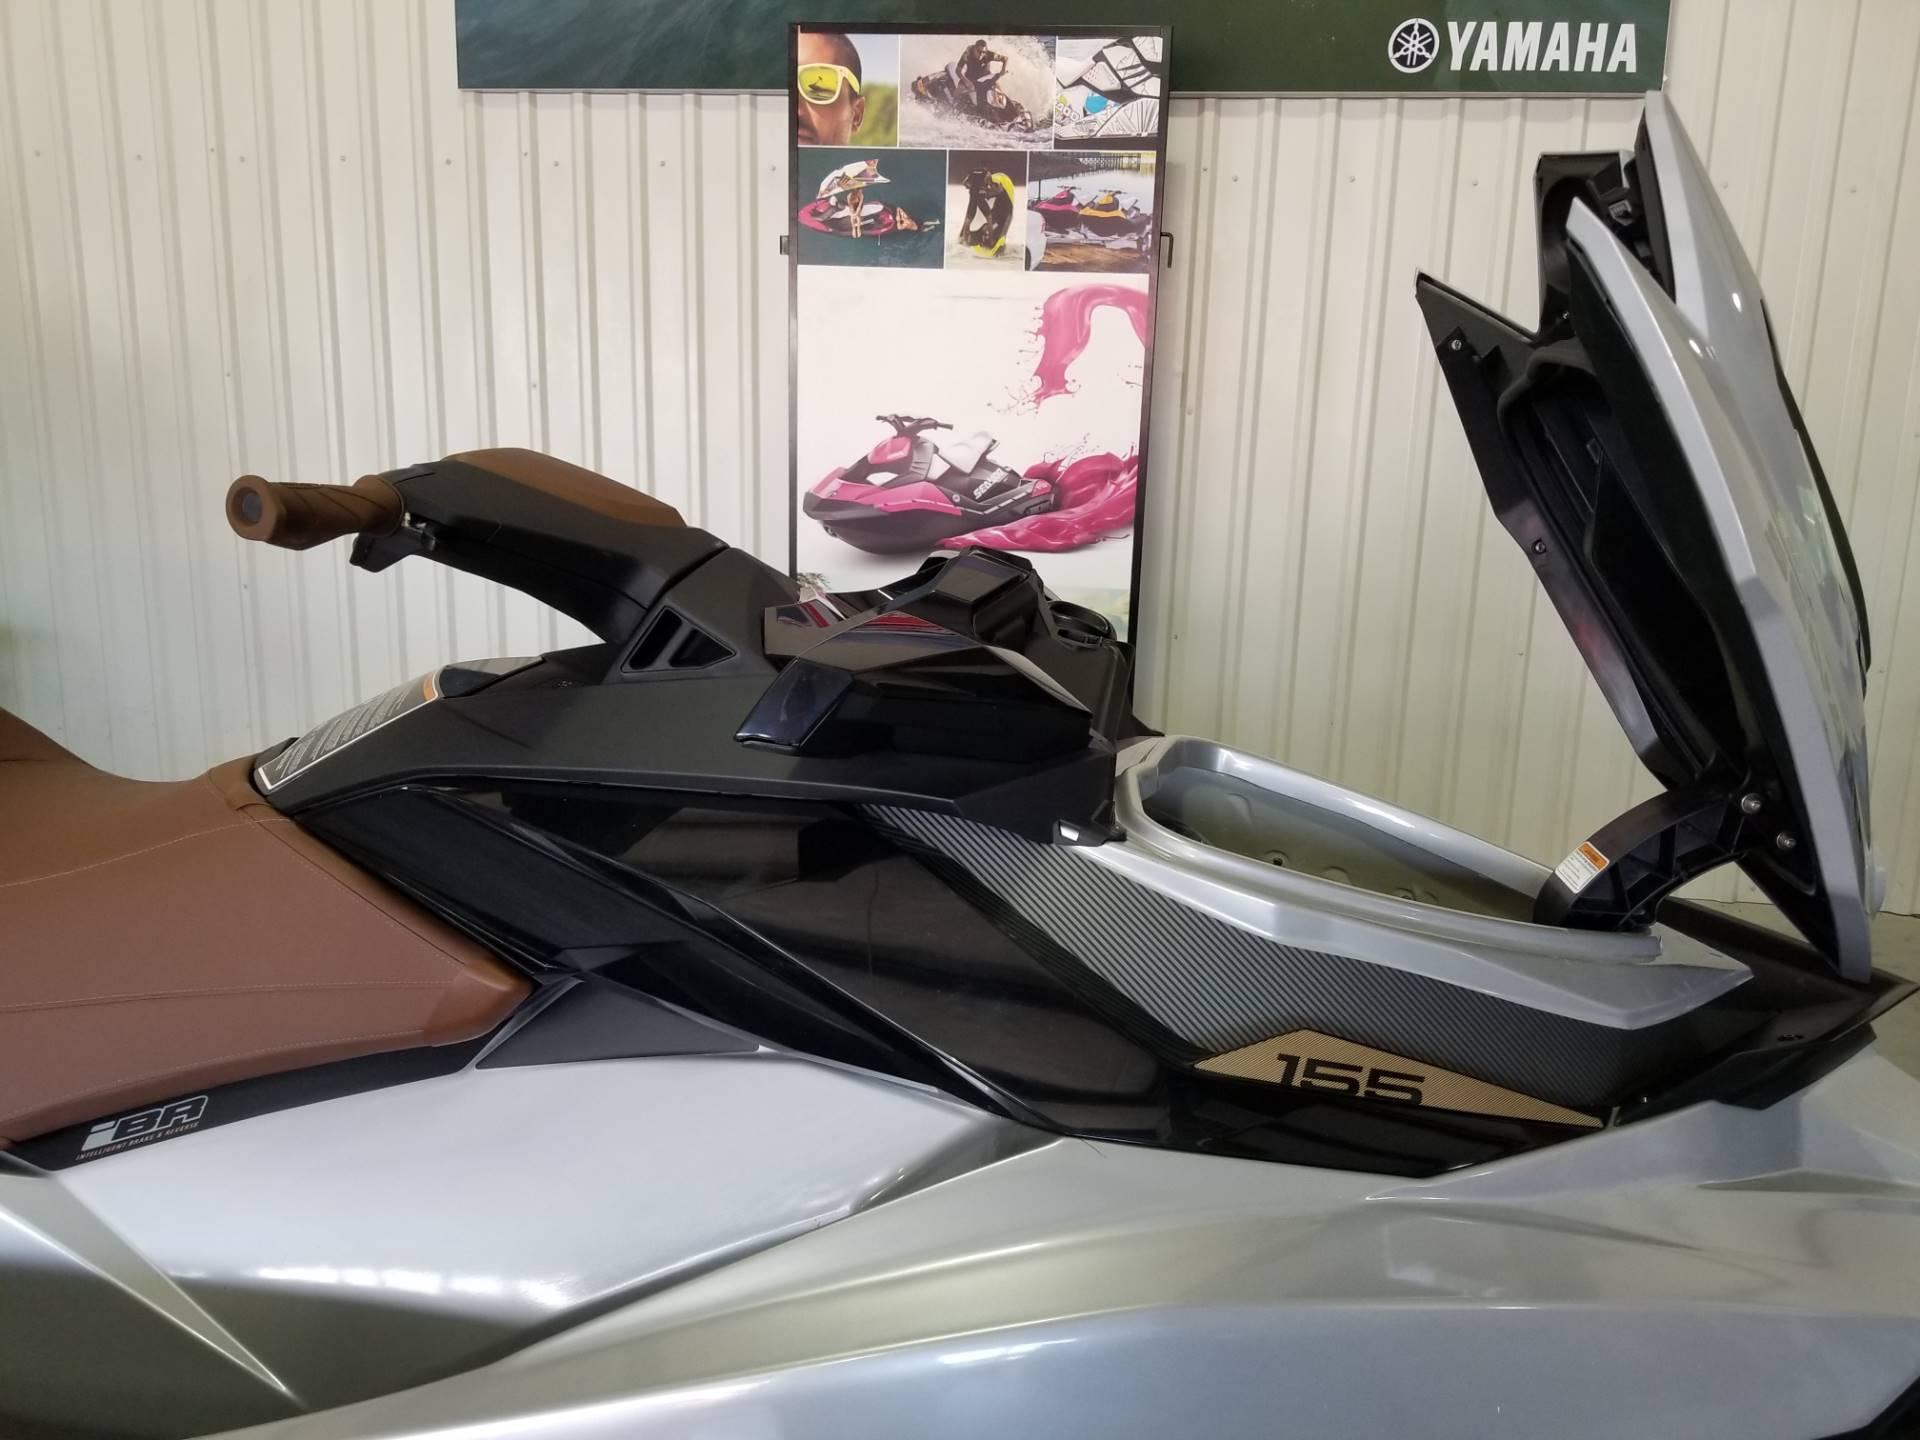 2018 Sea-Doo GTI Limited 155 9